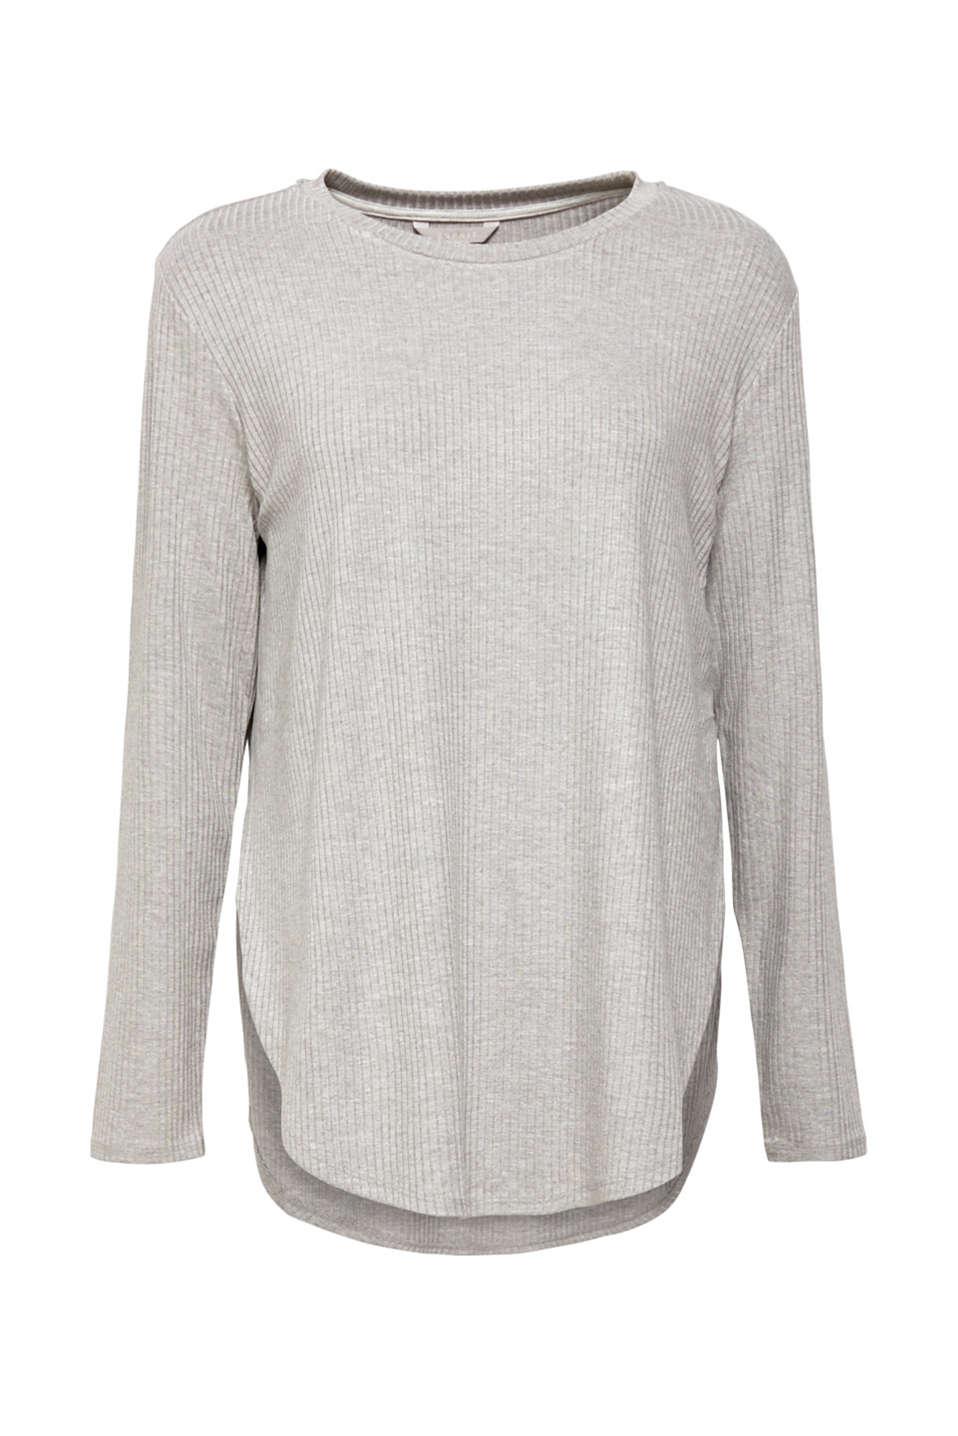 T-Shirts, GREY 2, detail image number 5